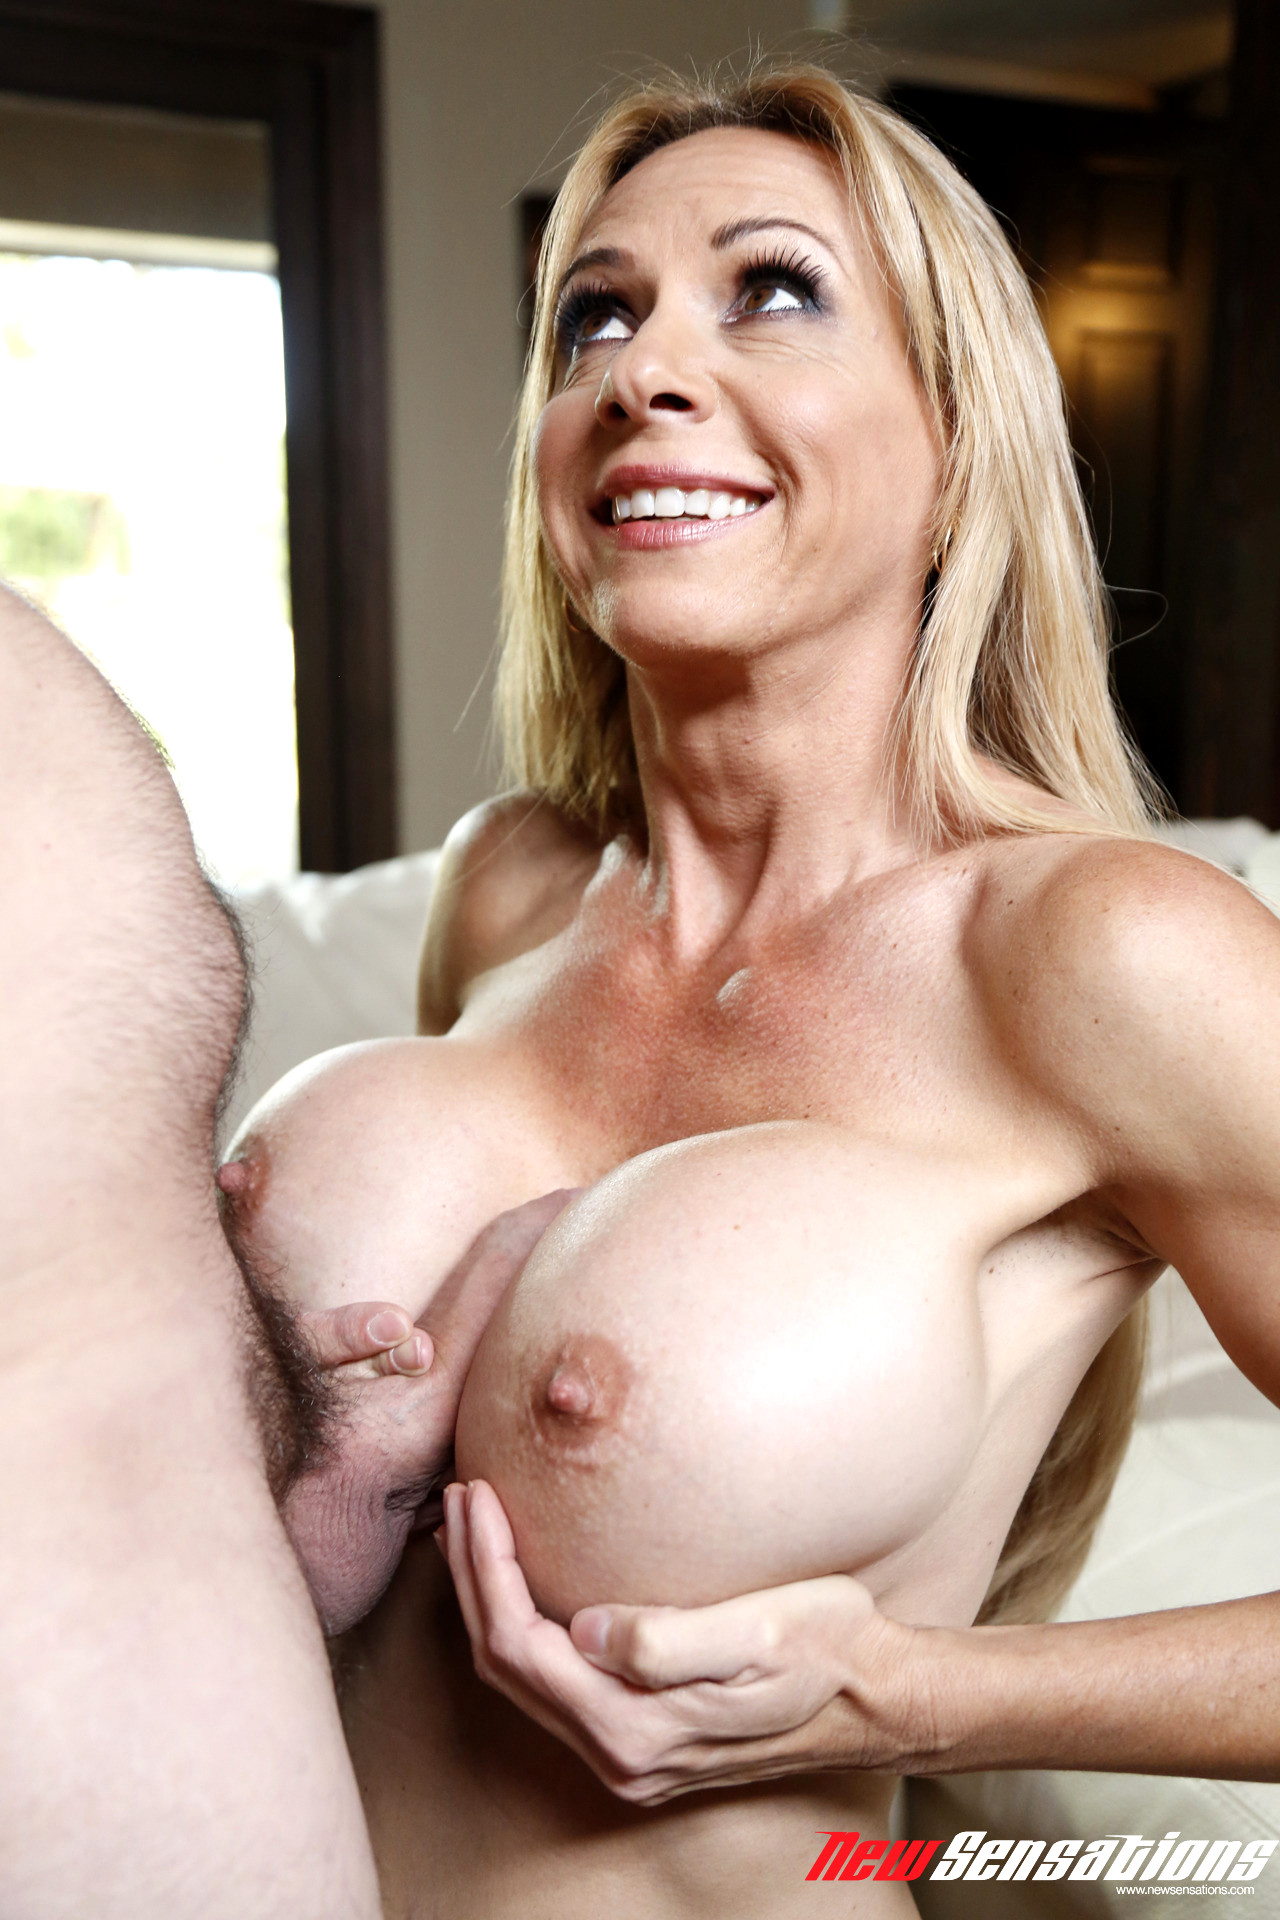 Brooke tyler anal